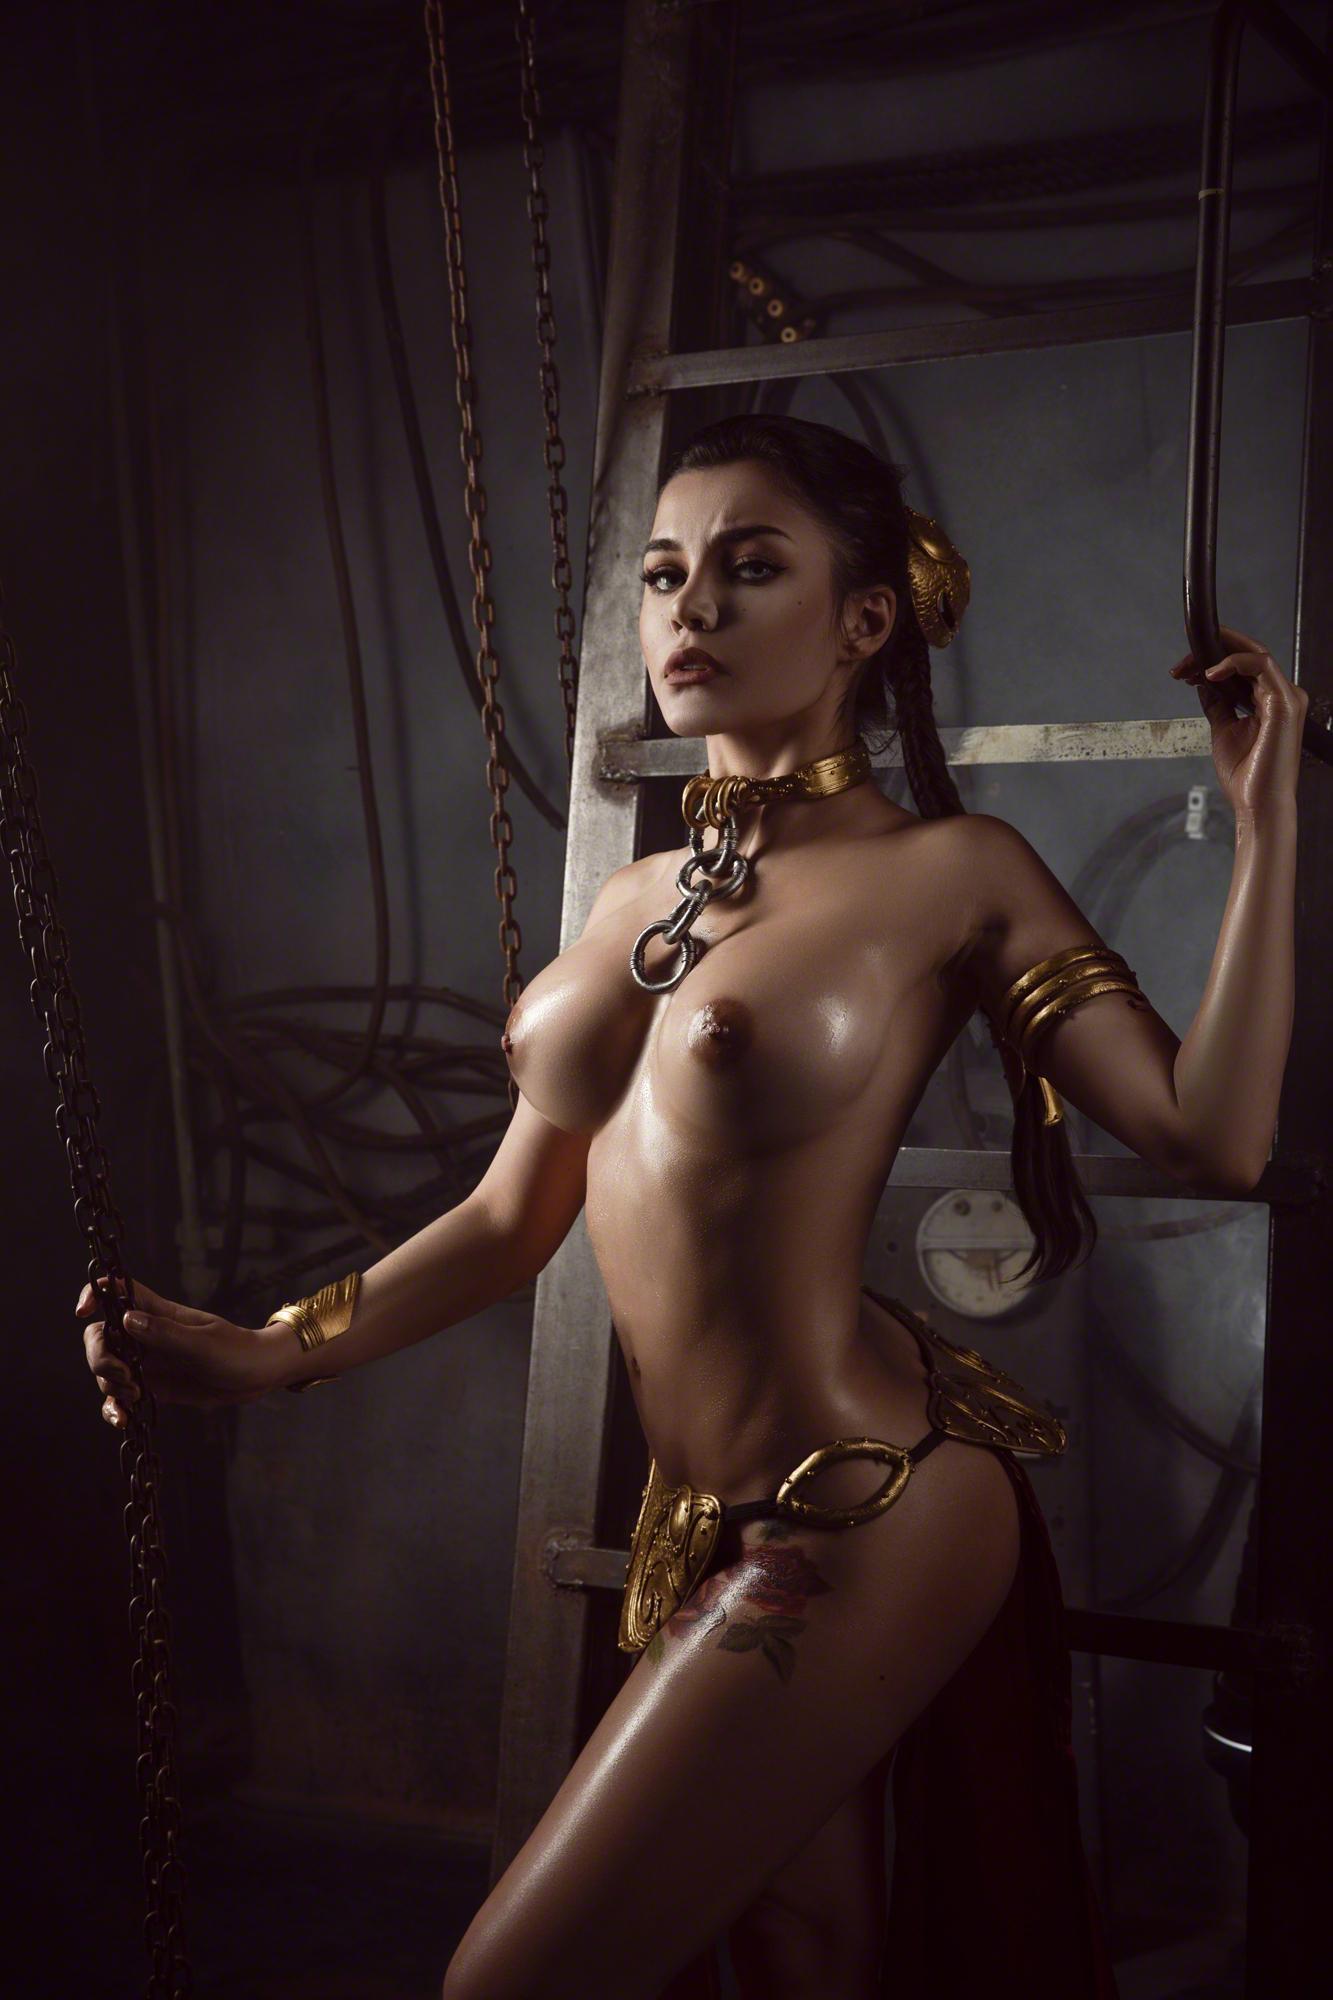 Kalinka Fox Nude Princess Leia Cosplay Set Leaked Cuccpg